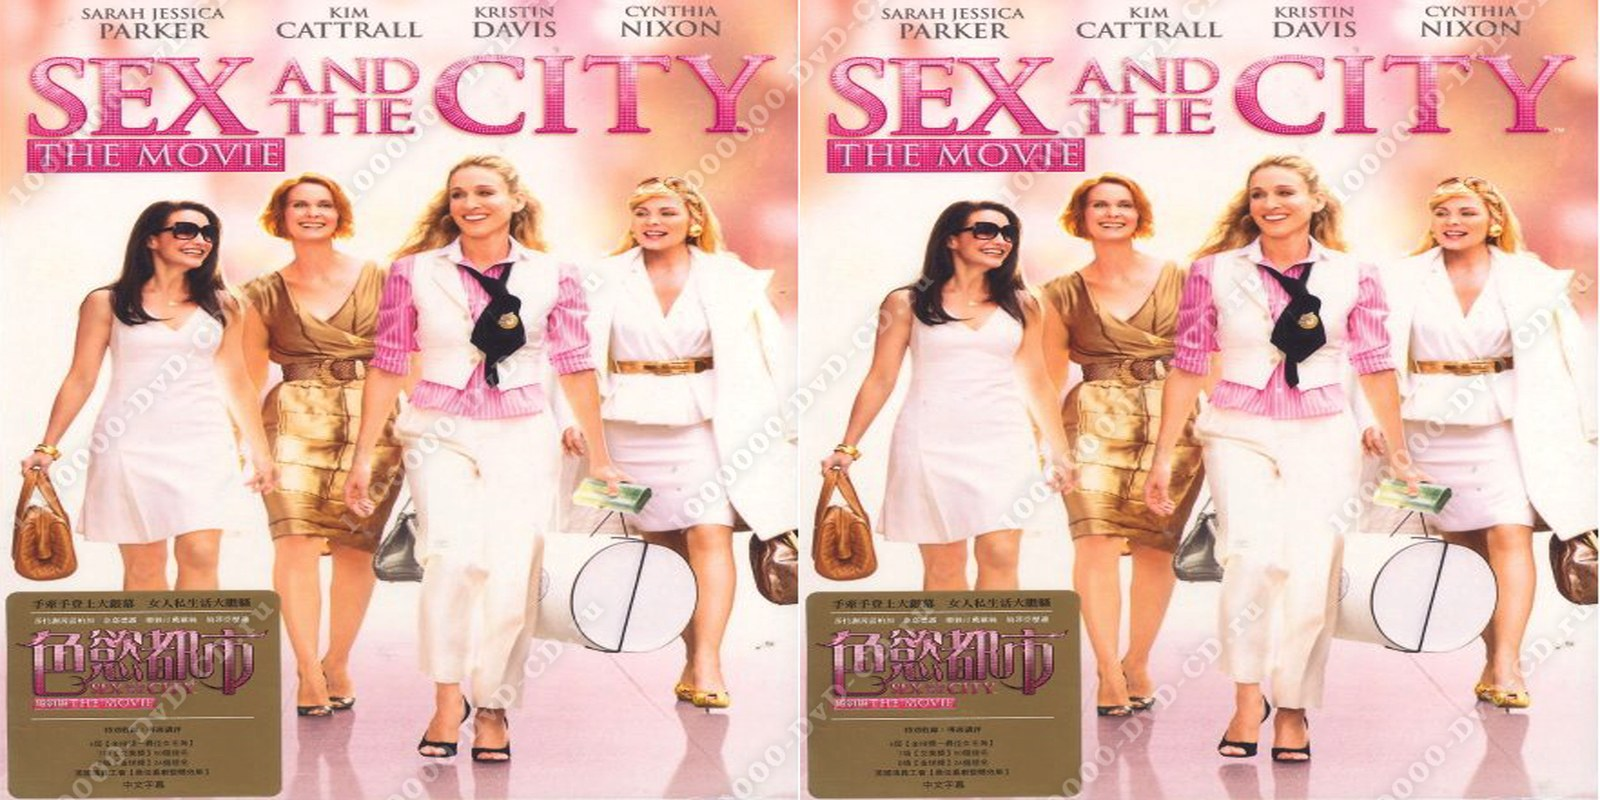 kupit-seks-v-bolshom-gorode-na-dvd